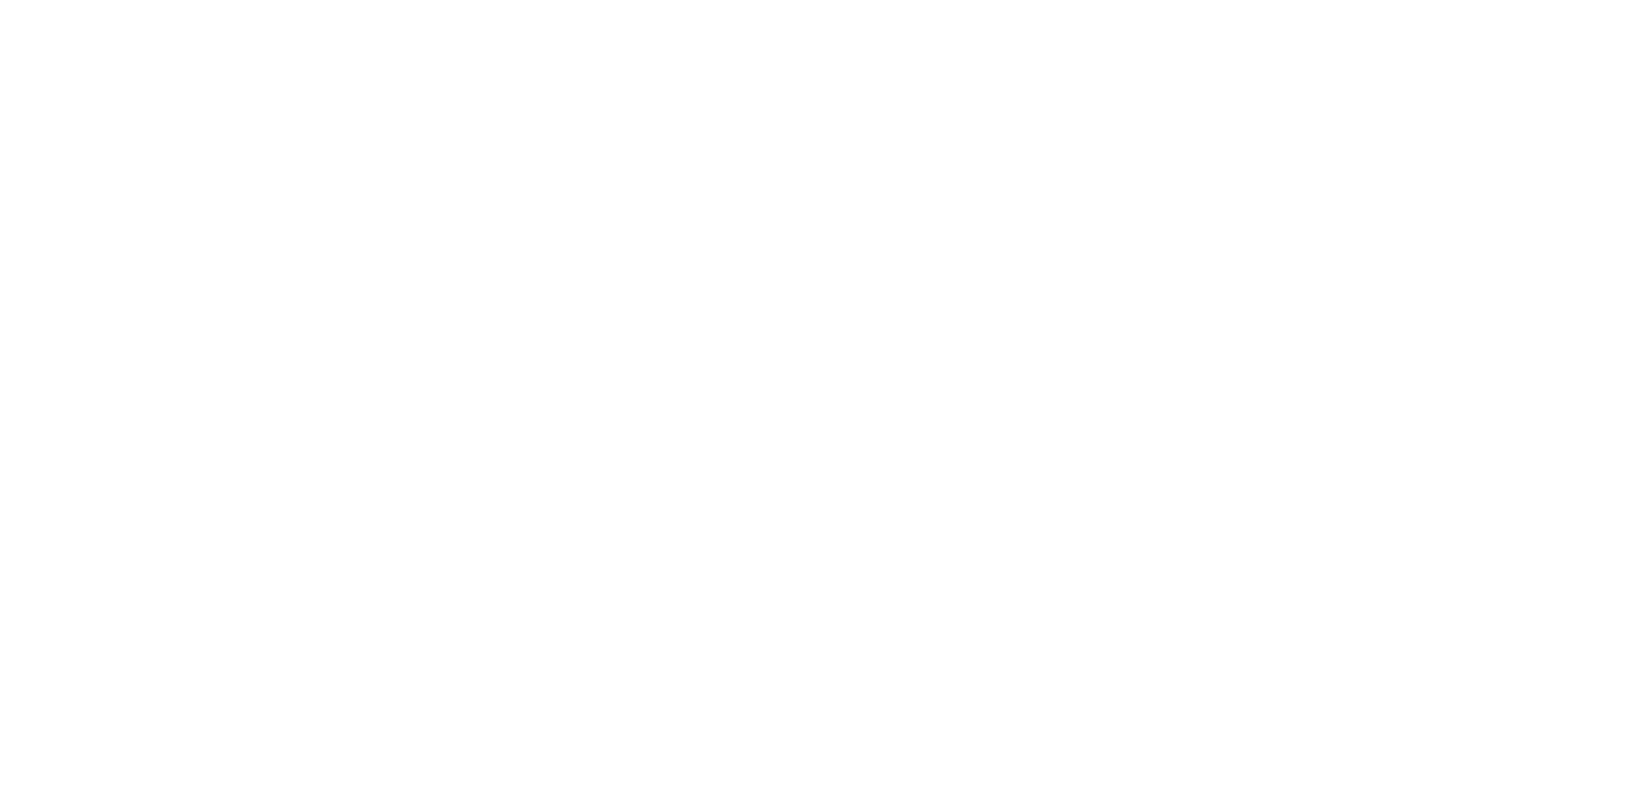 sympa-logo-white